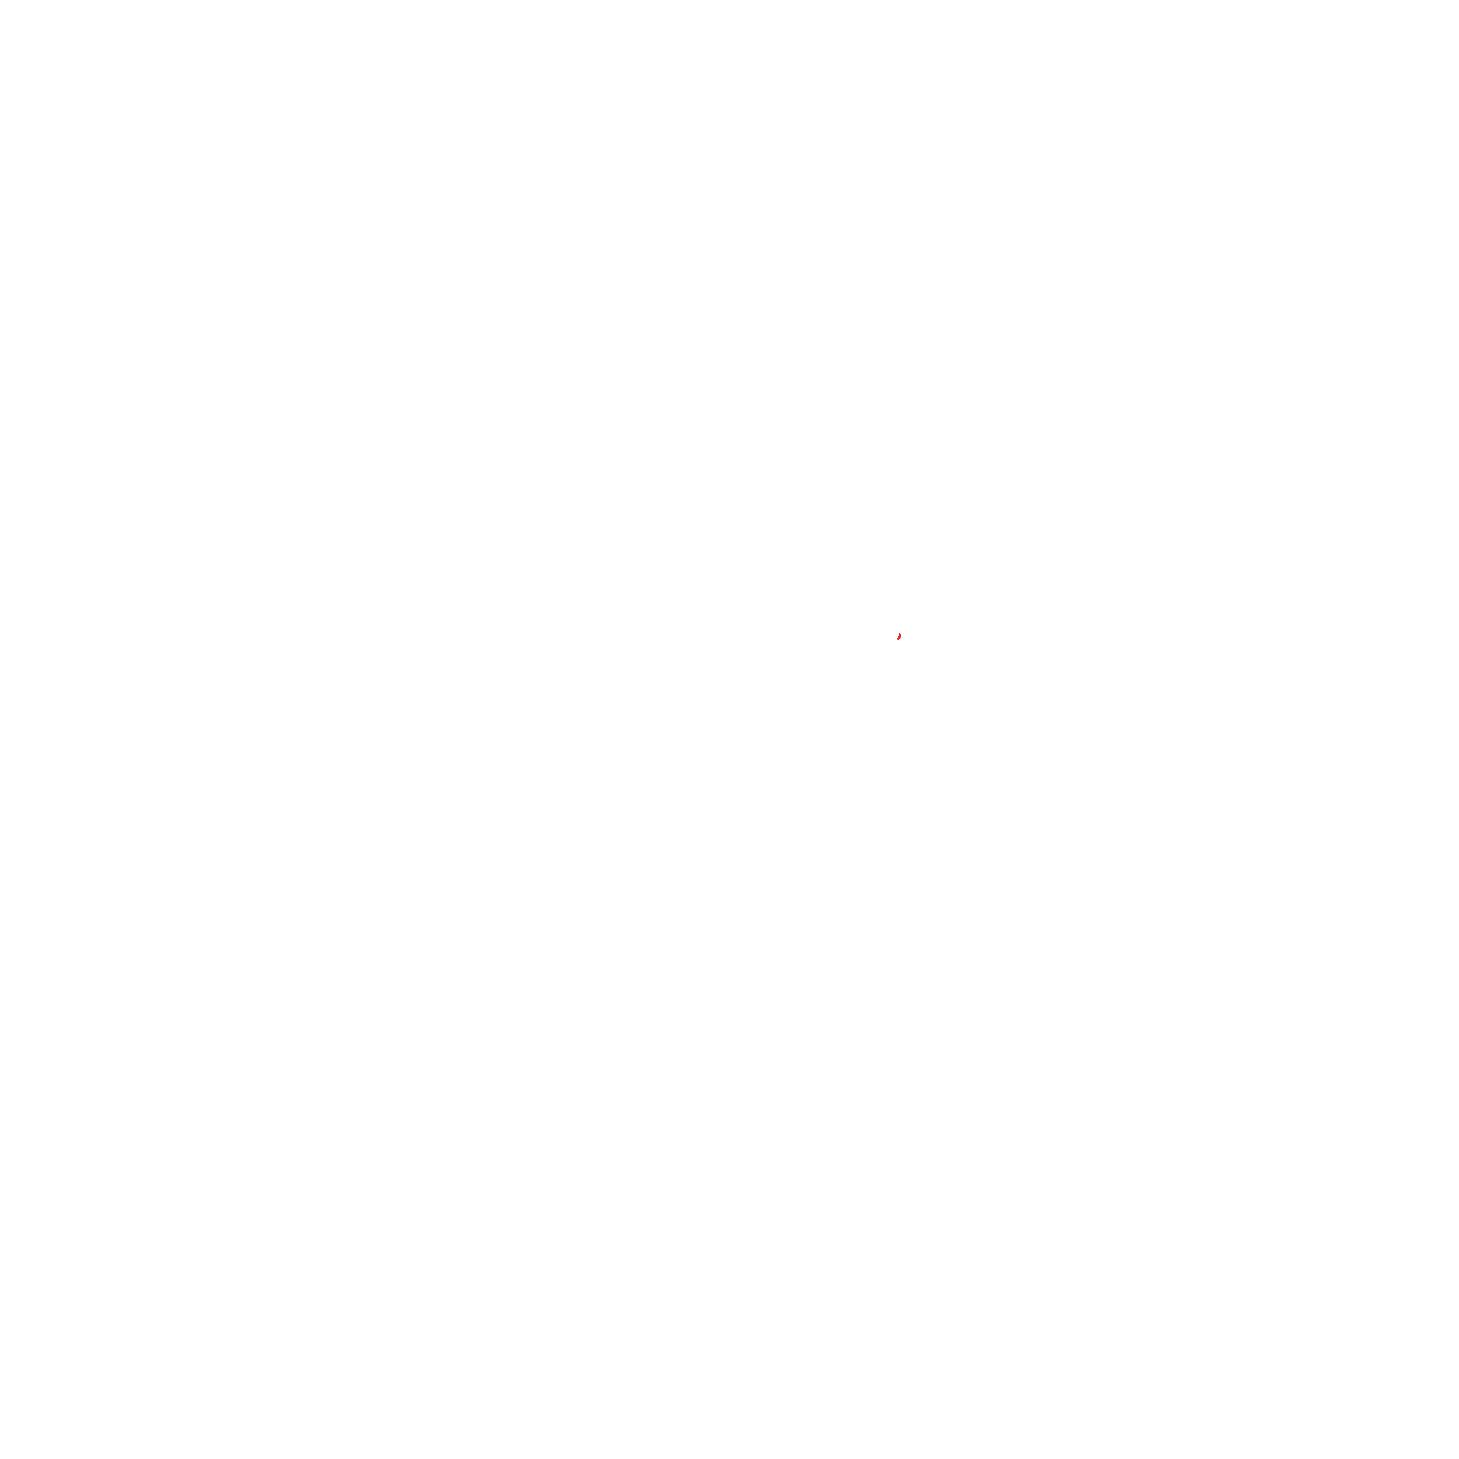 monryok